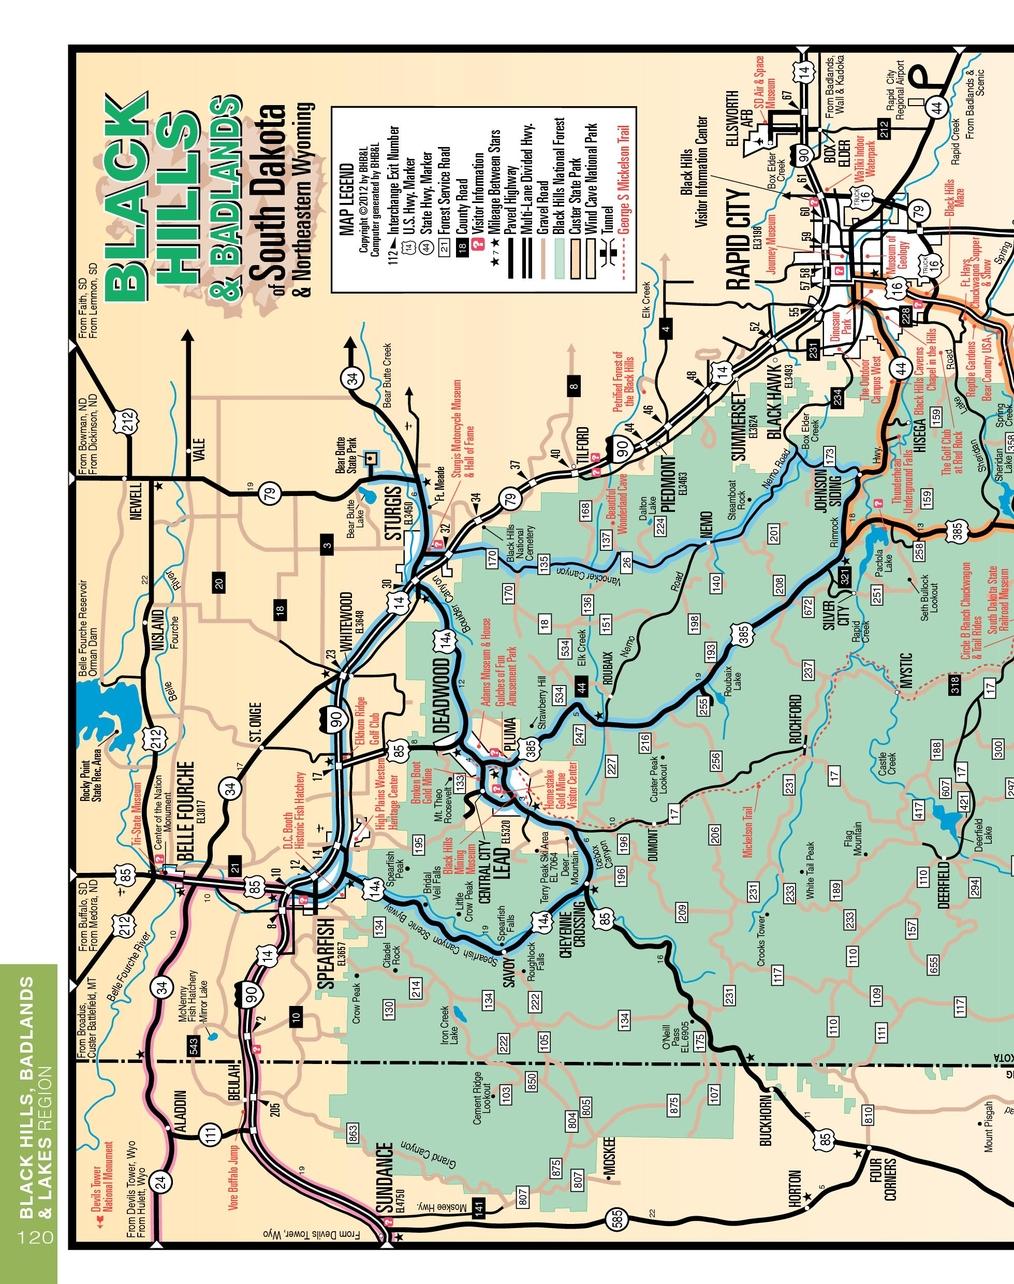 South Dakota Vacation Guide 2012